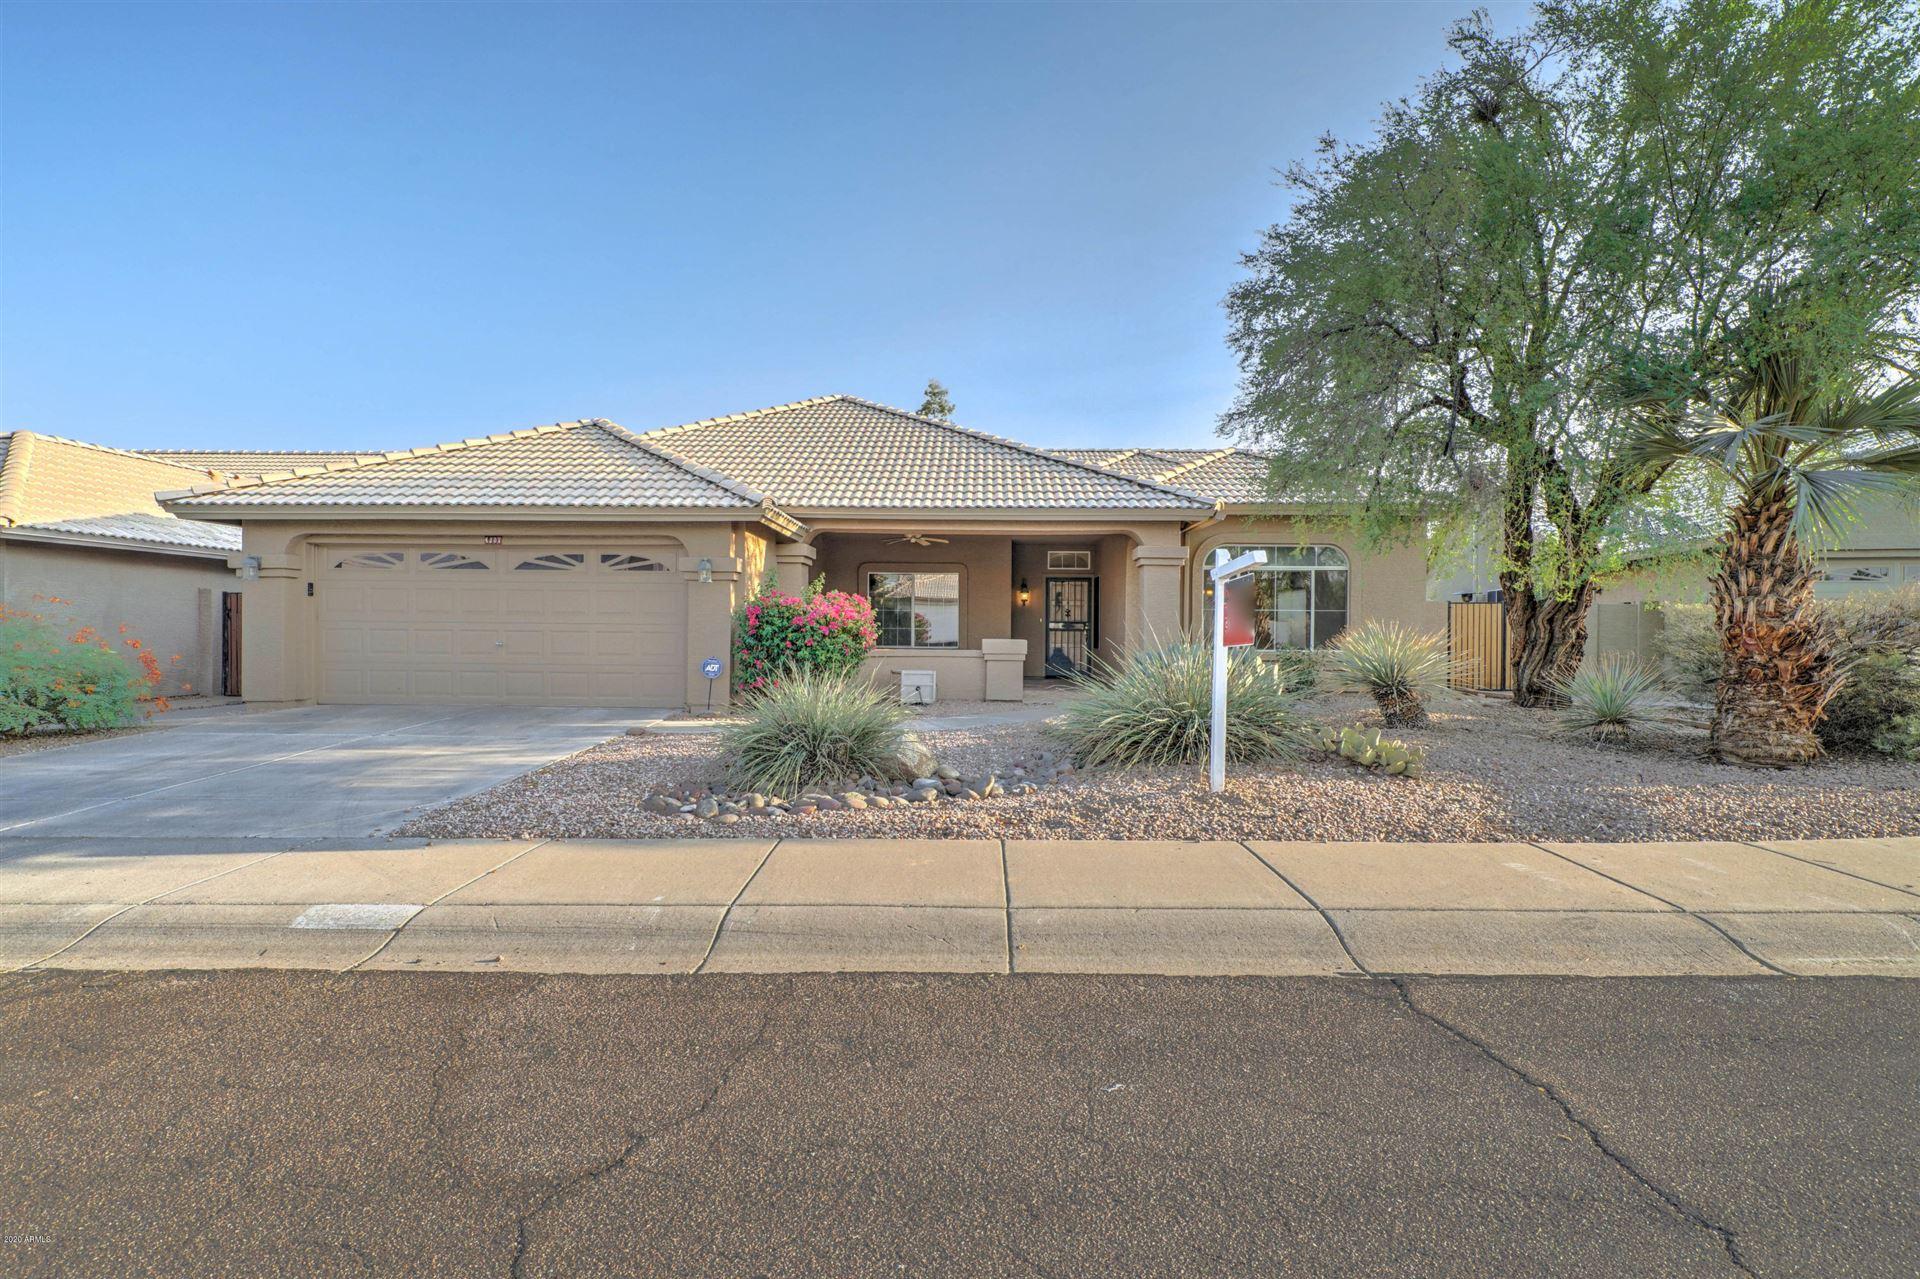 4207 E CATHEDRAL ROCK Drive, Phoenix, AZ 85044 - MLS#: 6133470